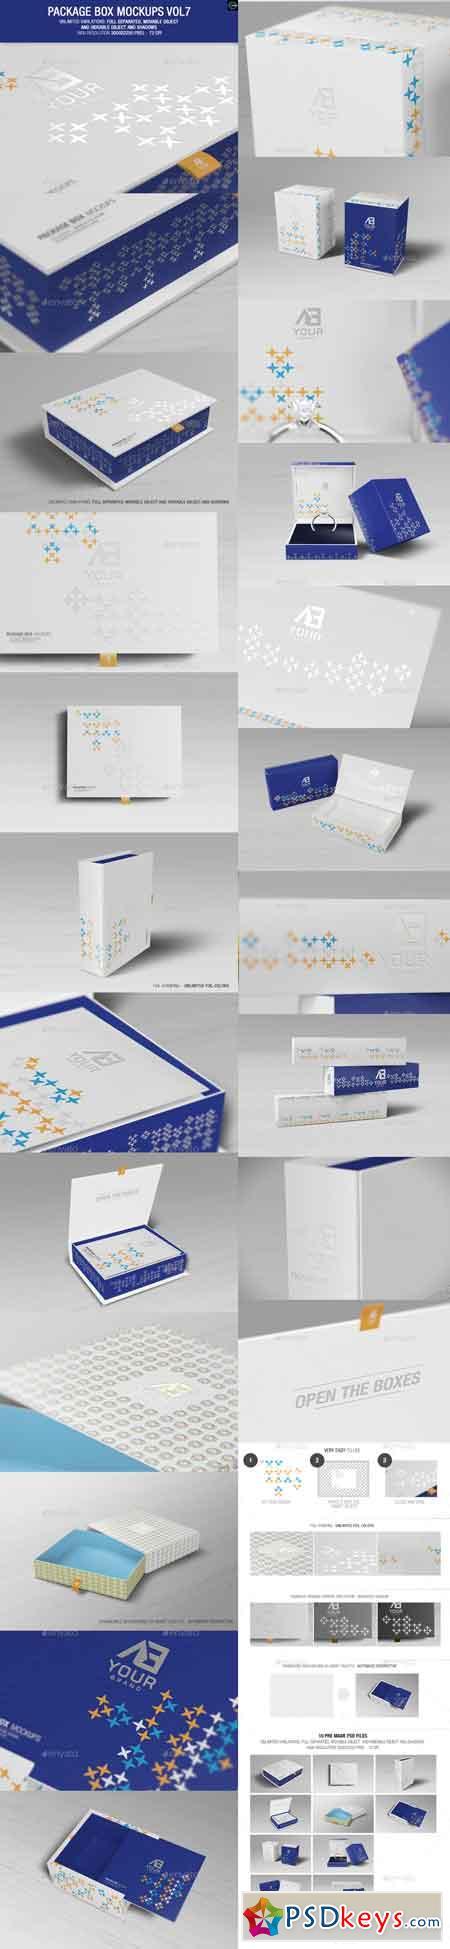 Package Box Mockups Vol7 9924029